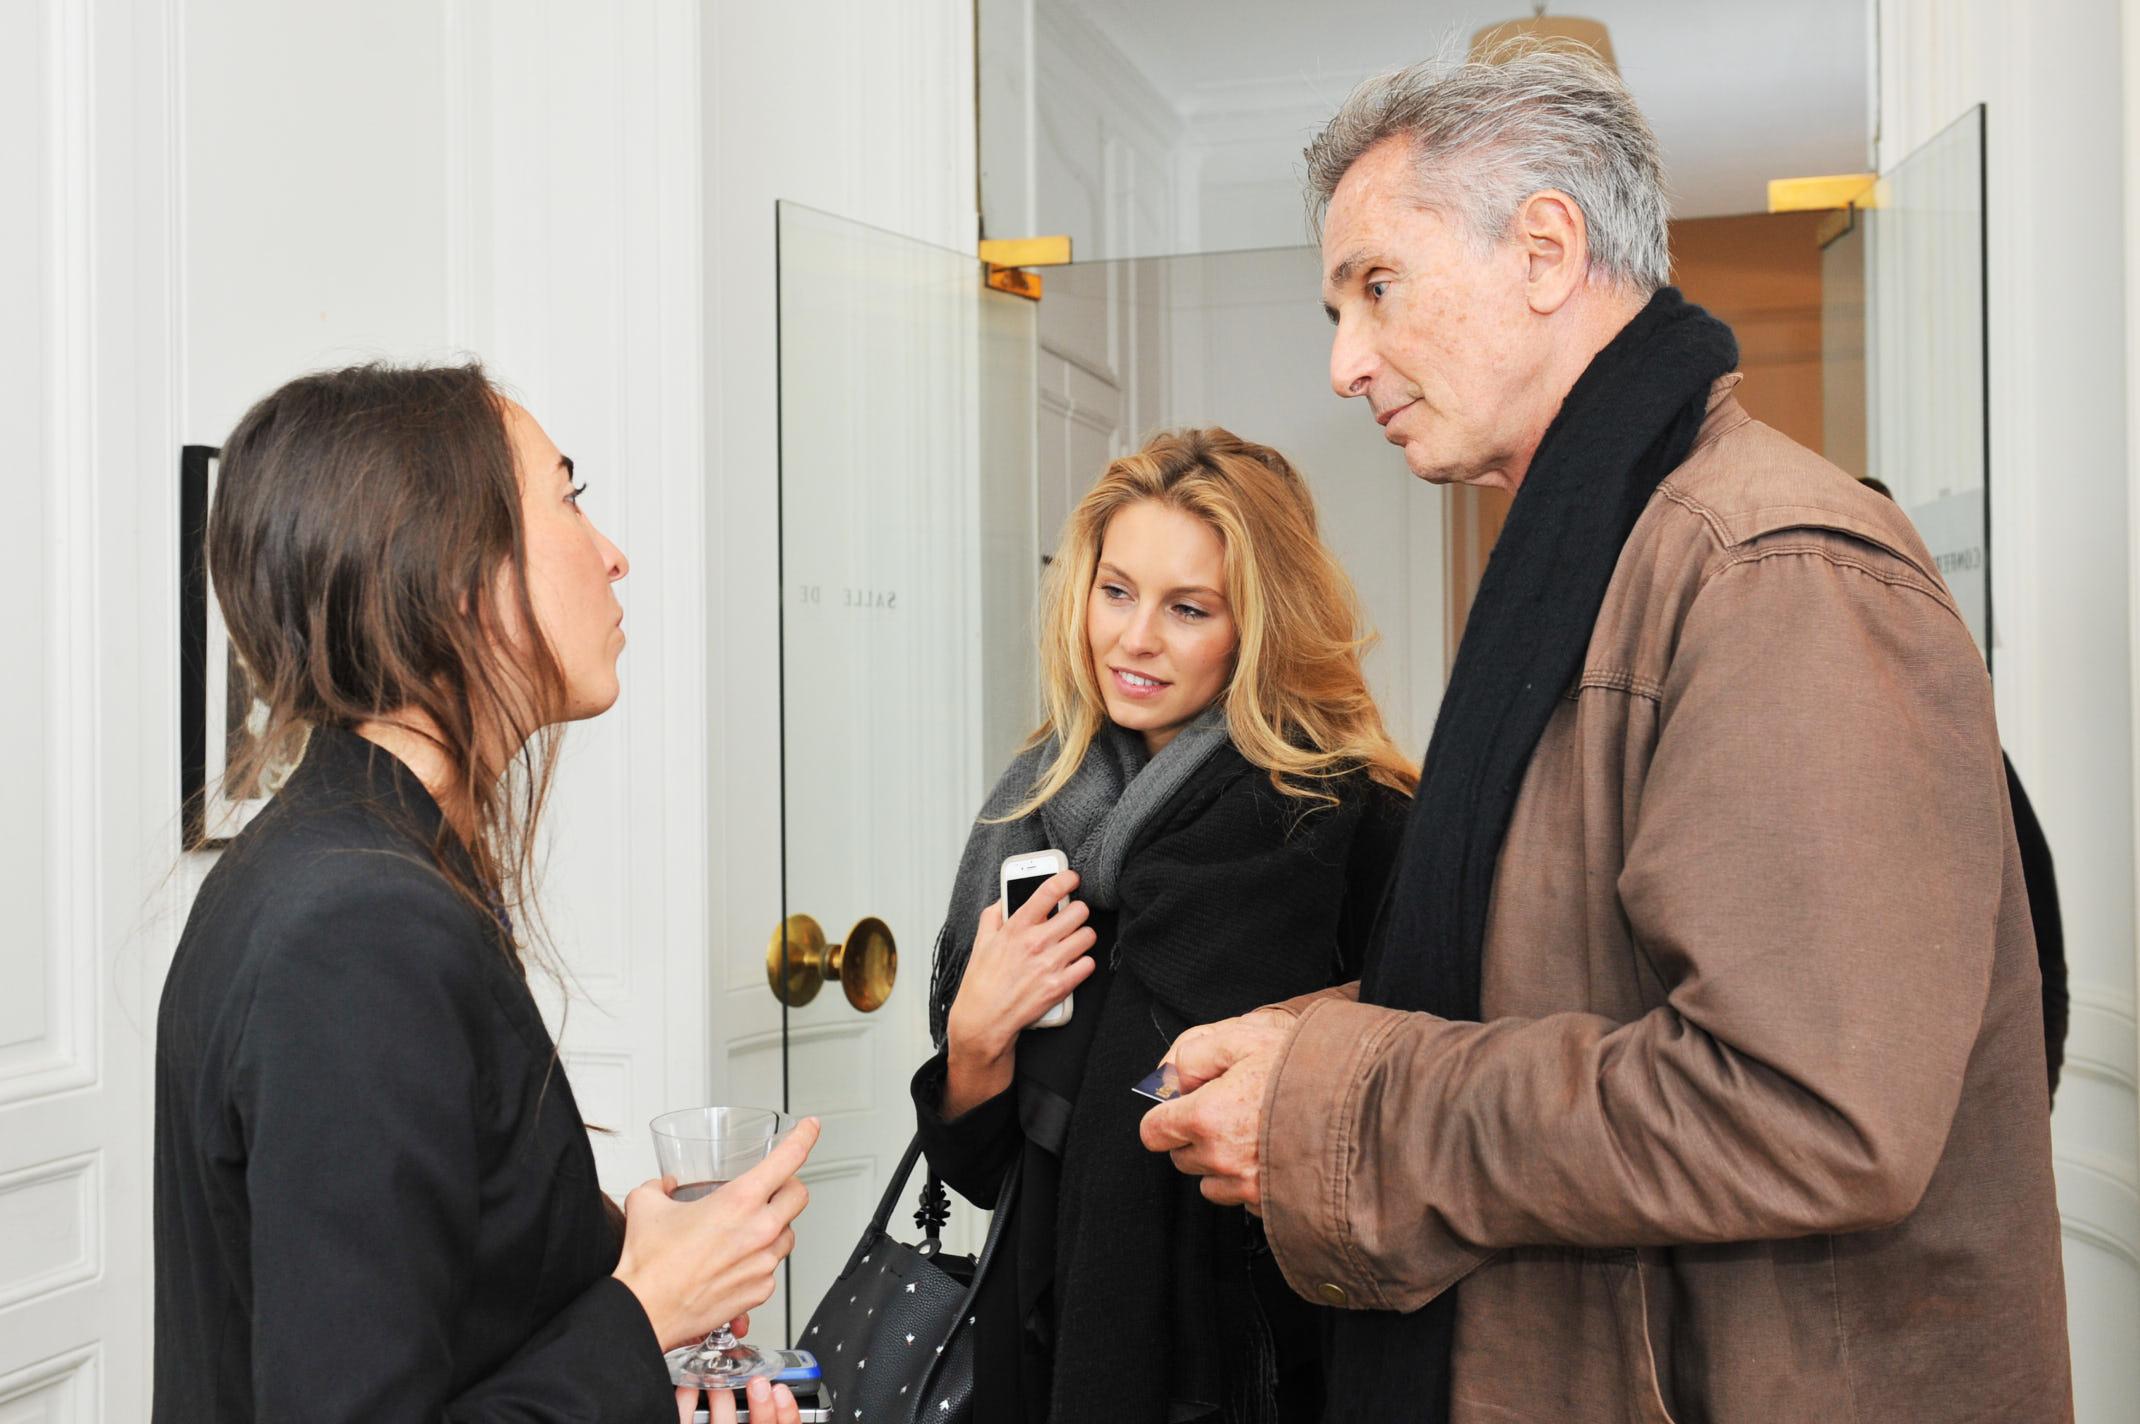 Thierry Lhermitte & Alicia Endemann